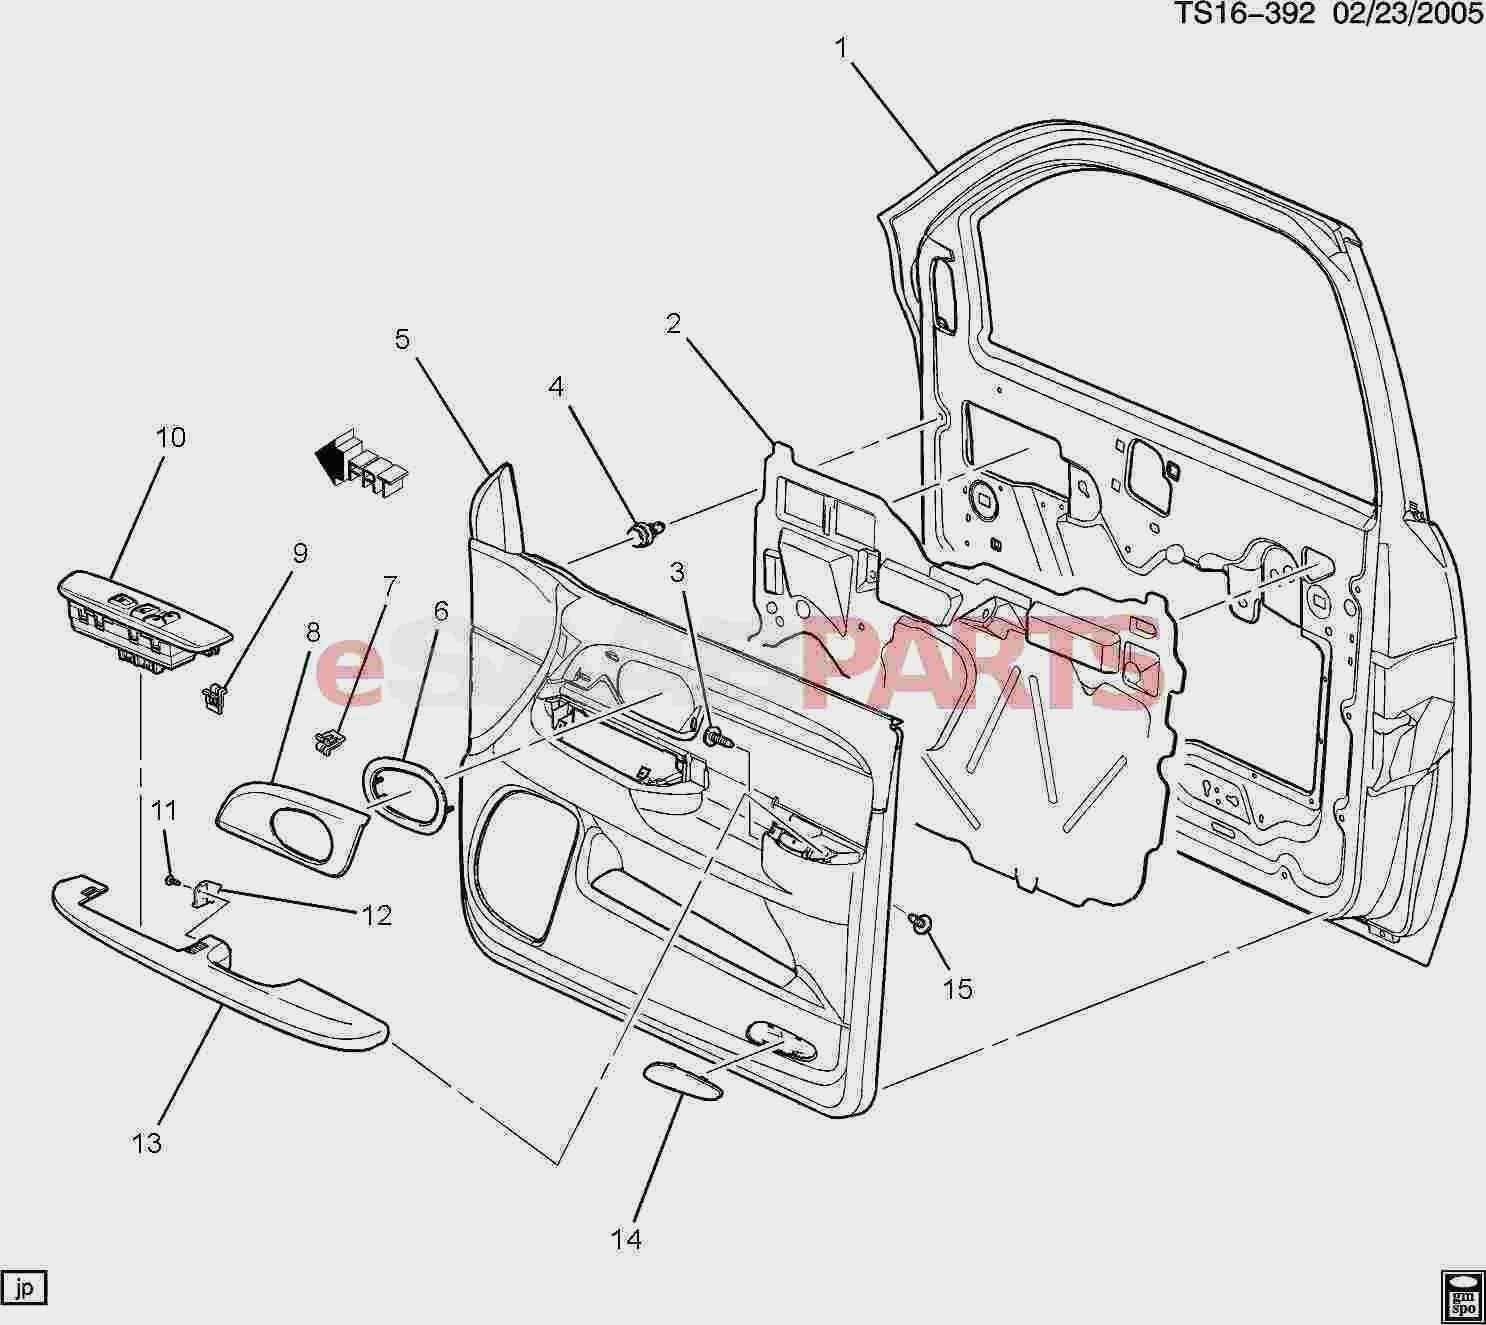 Diagram Of A Car Engine Saab Usa Parts Of Diagram Of A Car Engine